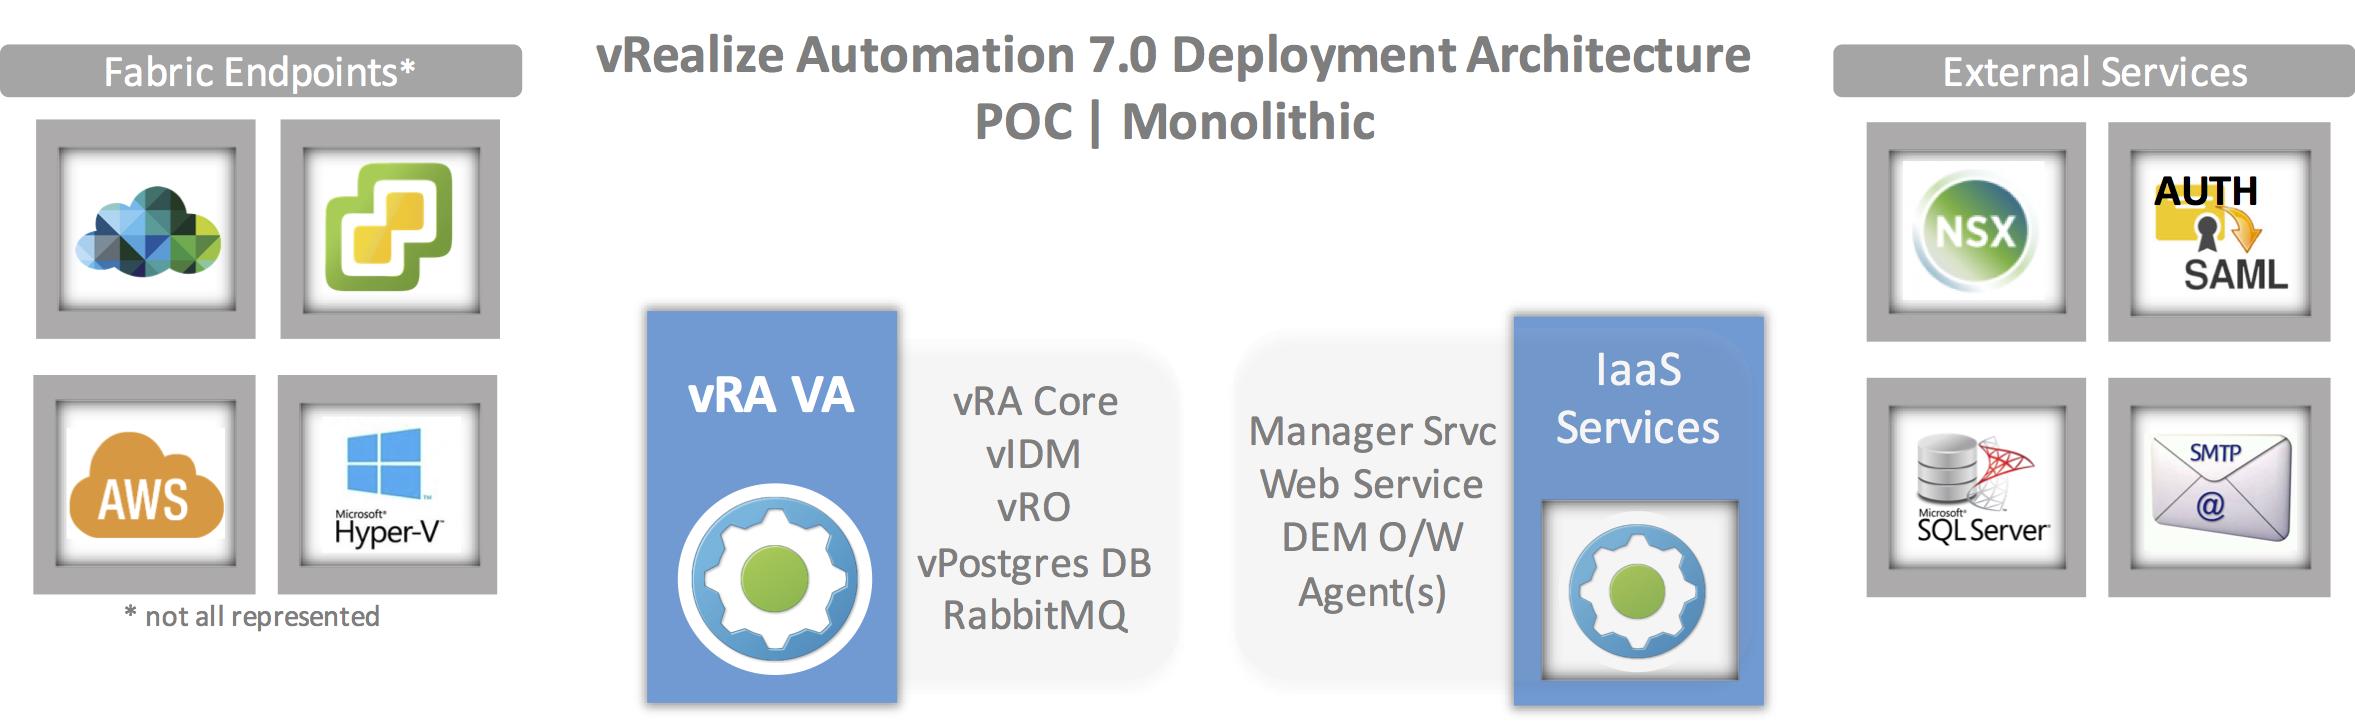 vRA Deployment Arch - mono